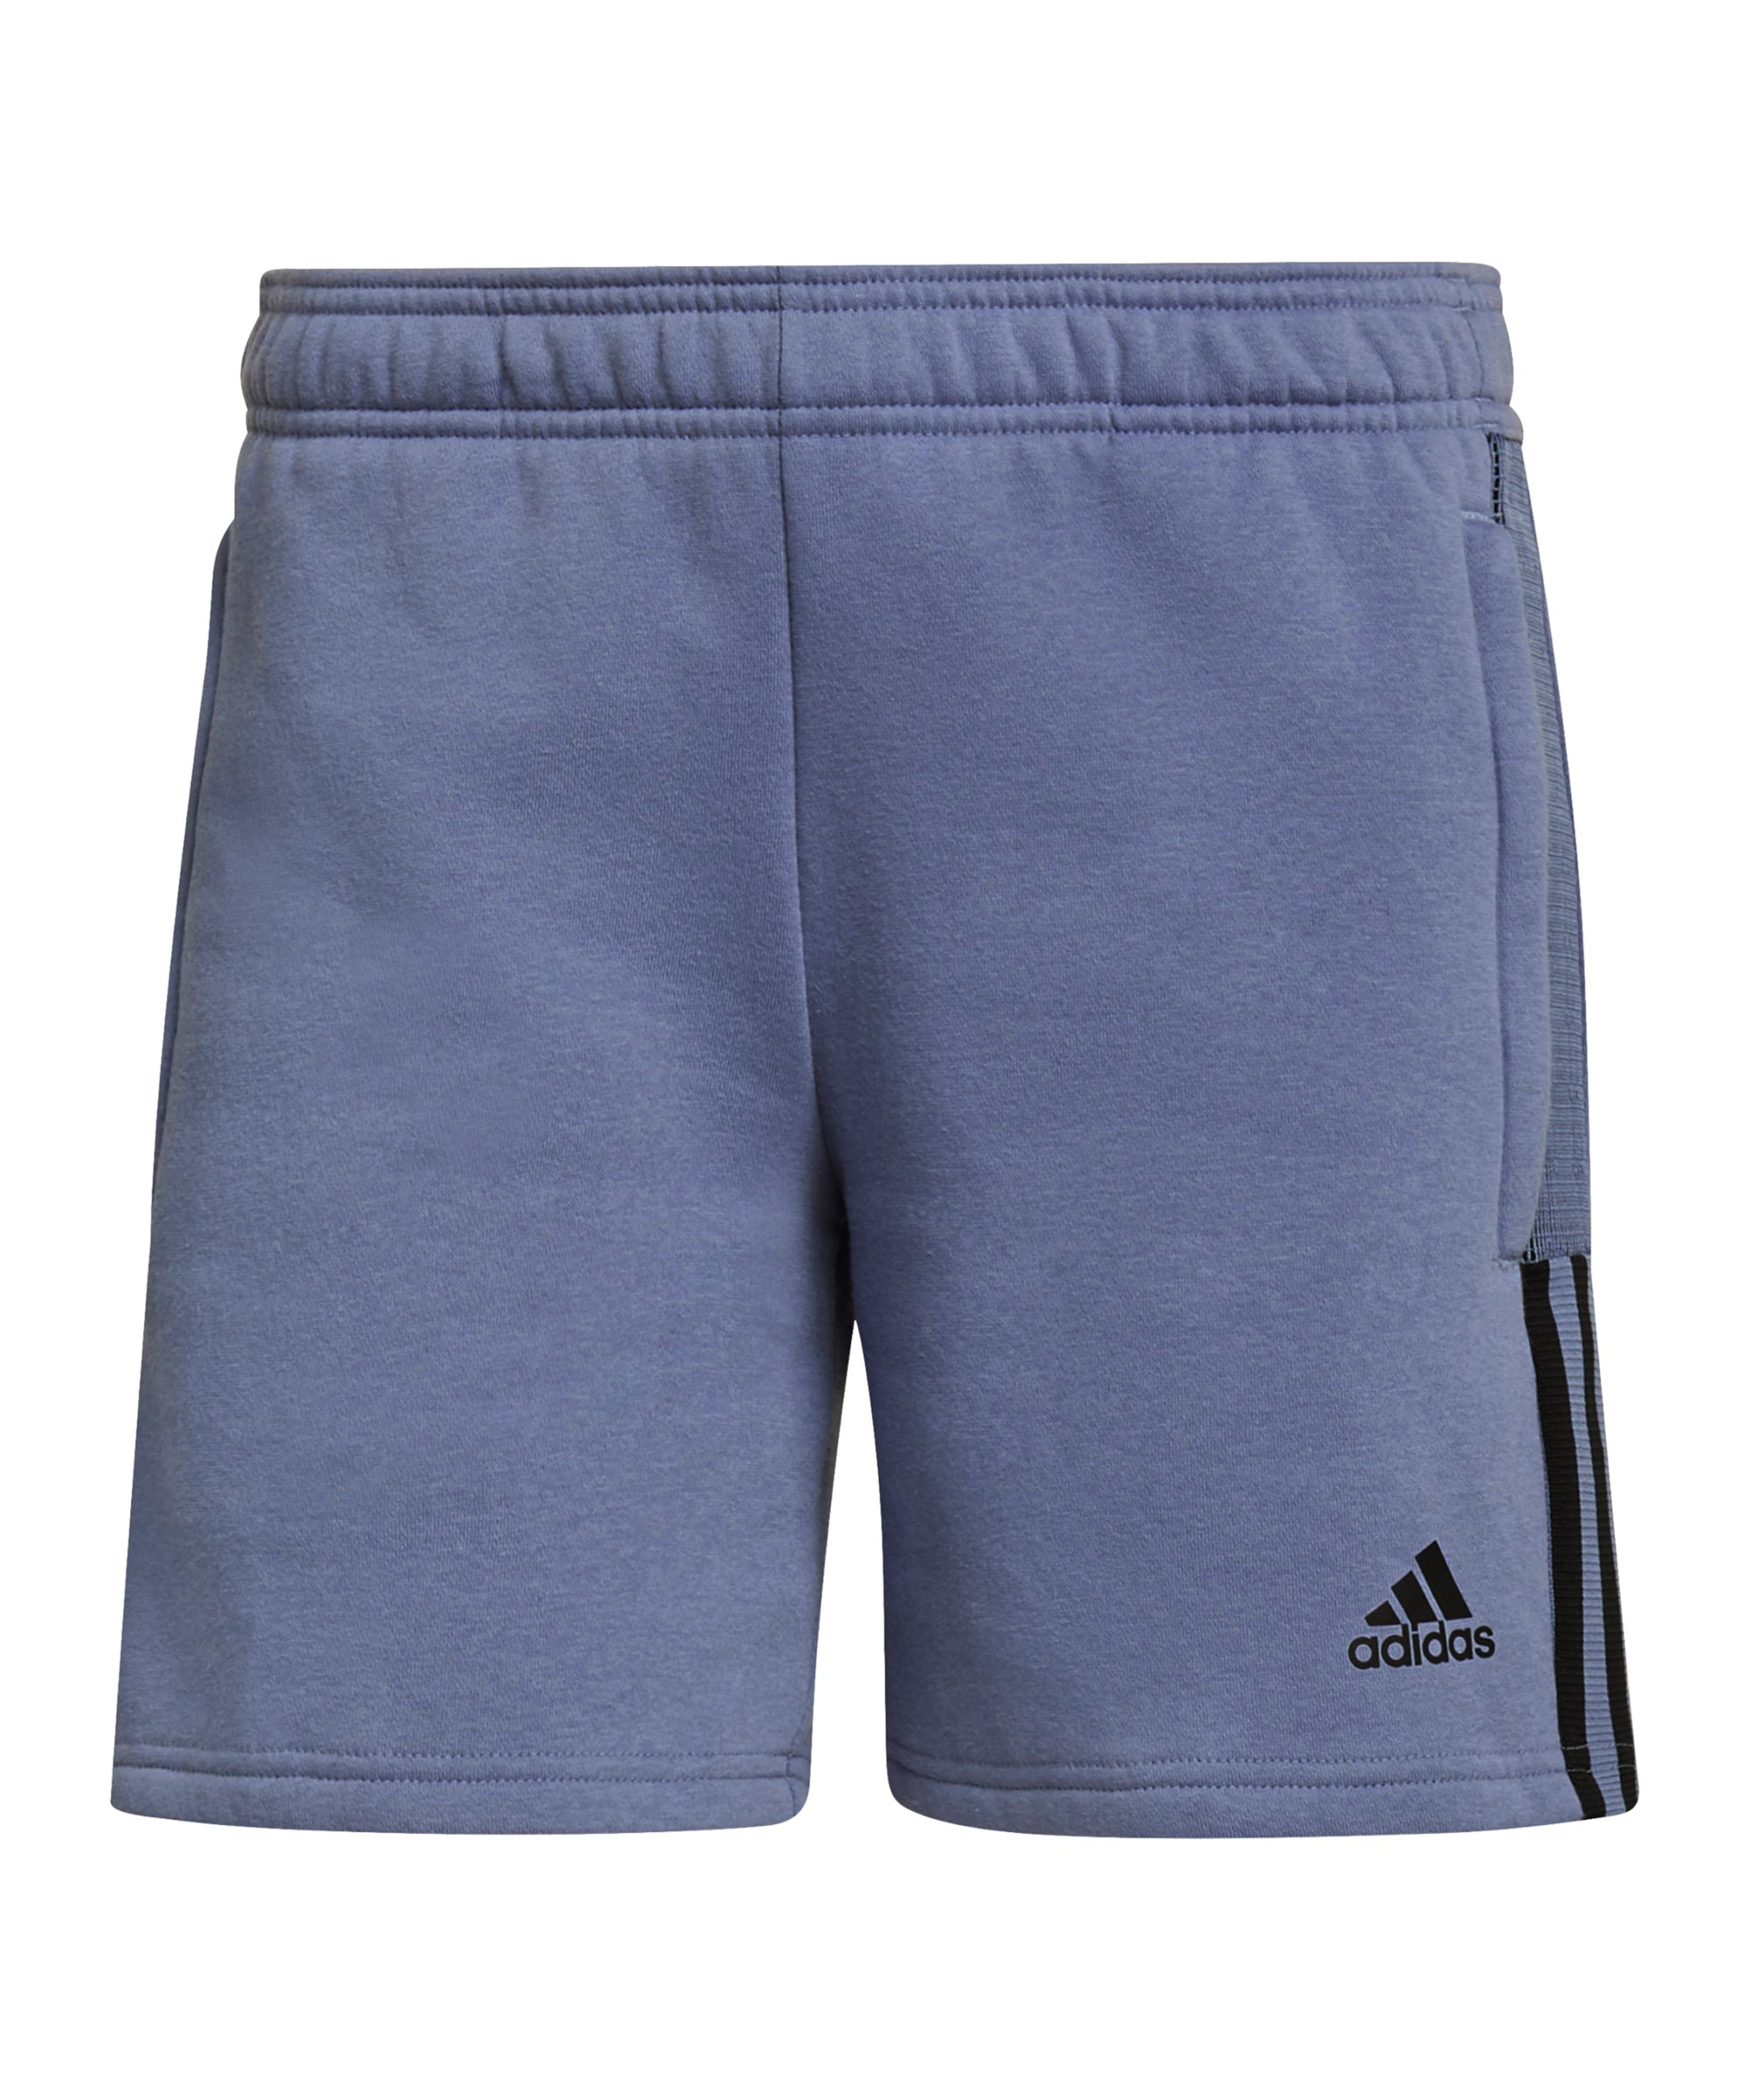 adidas Tiro Blocking Short Damen Blau - blau